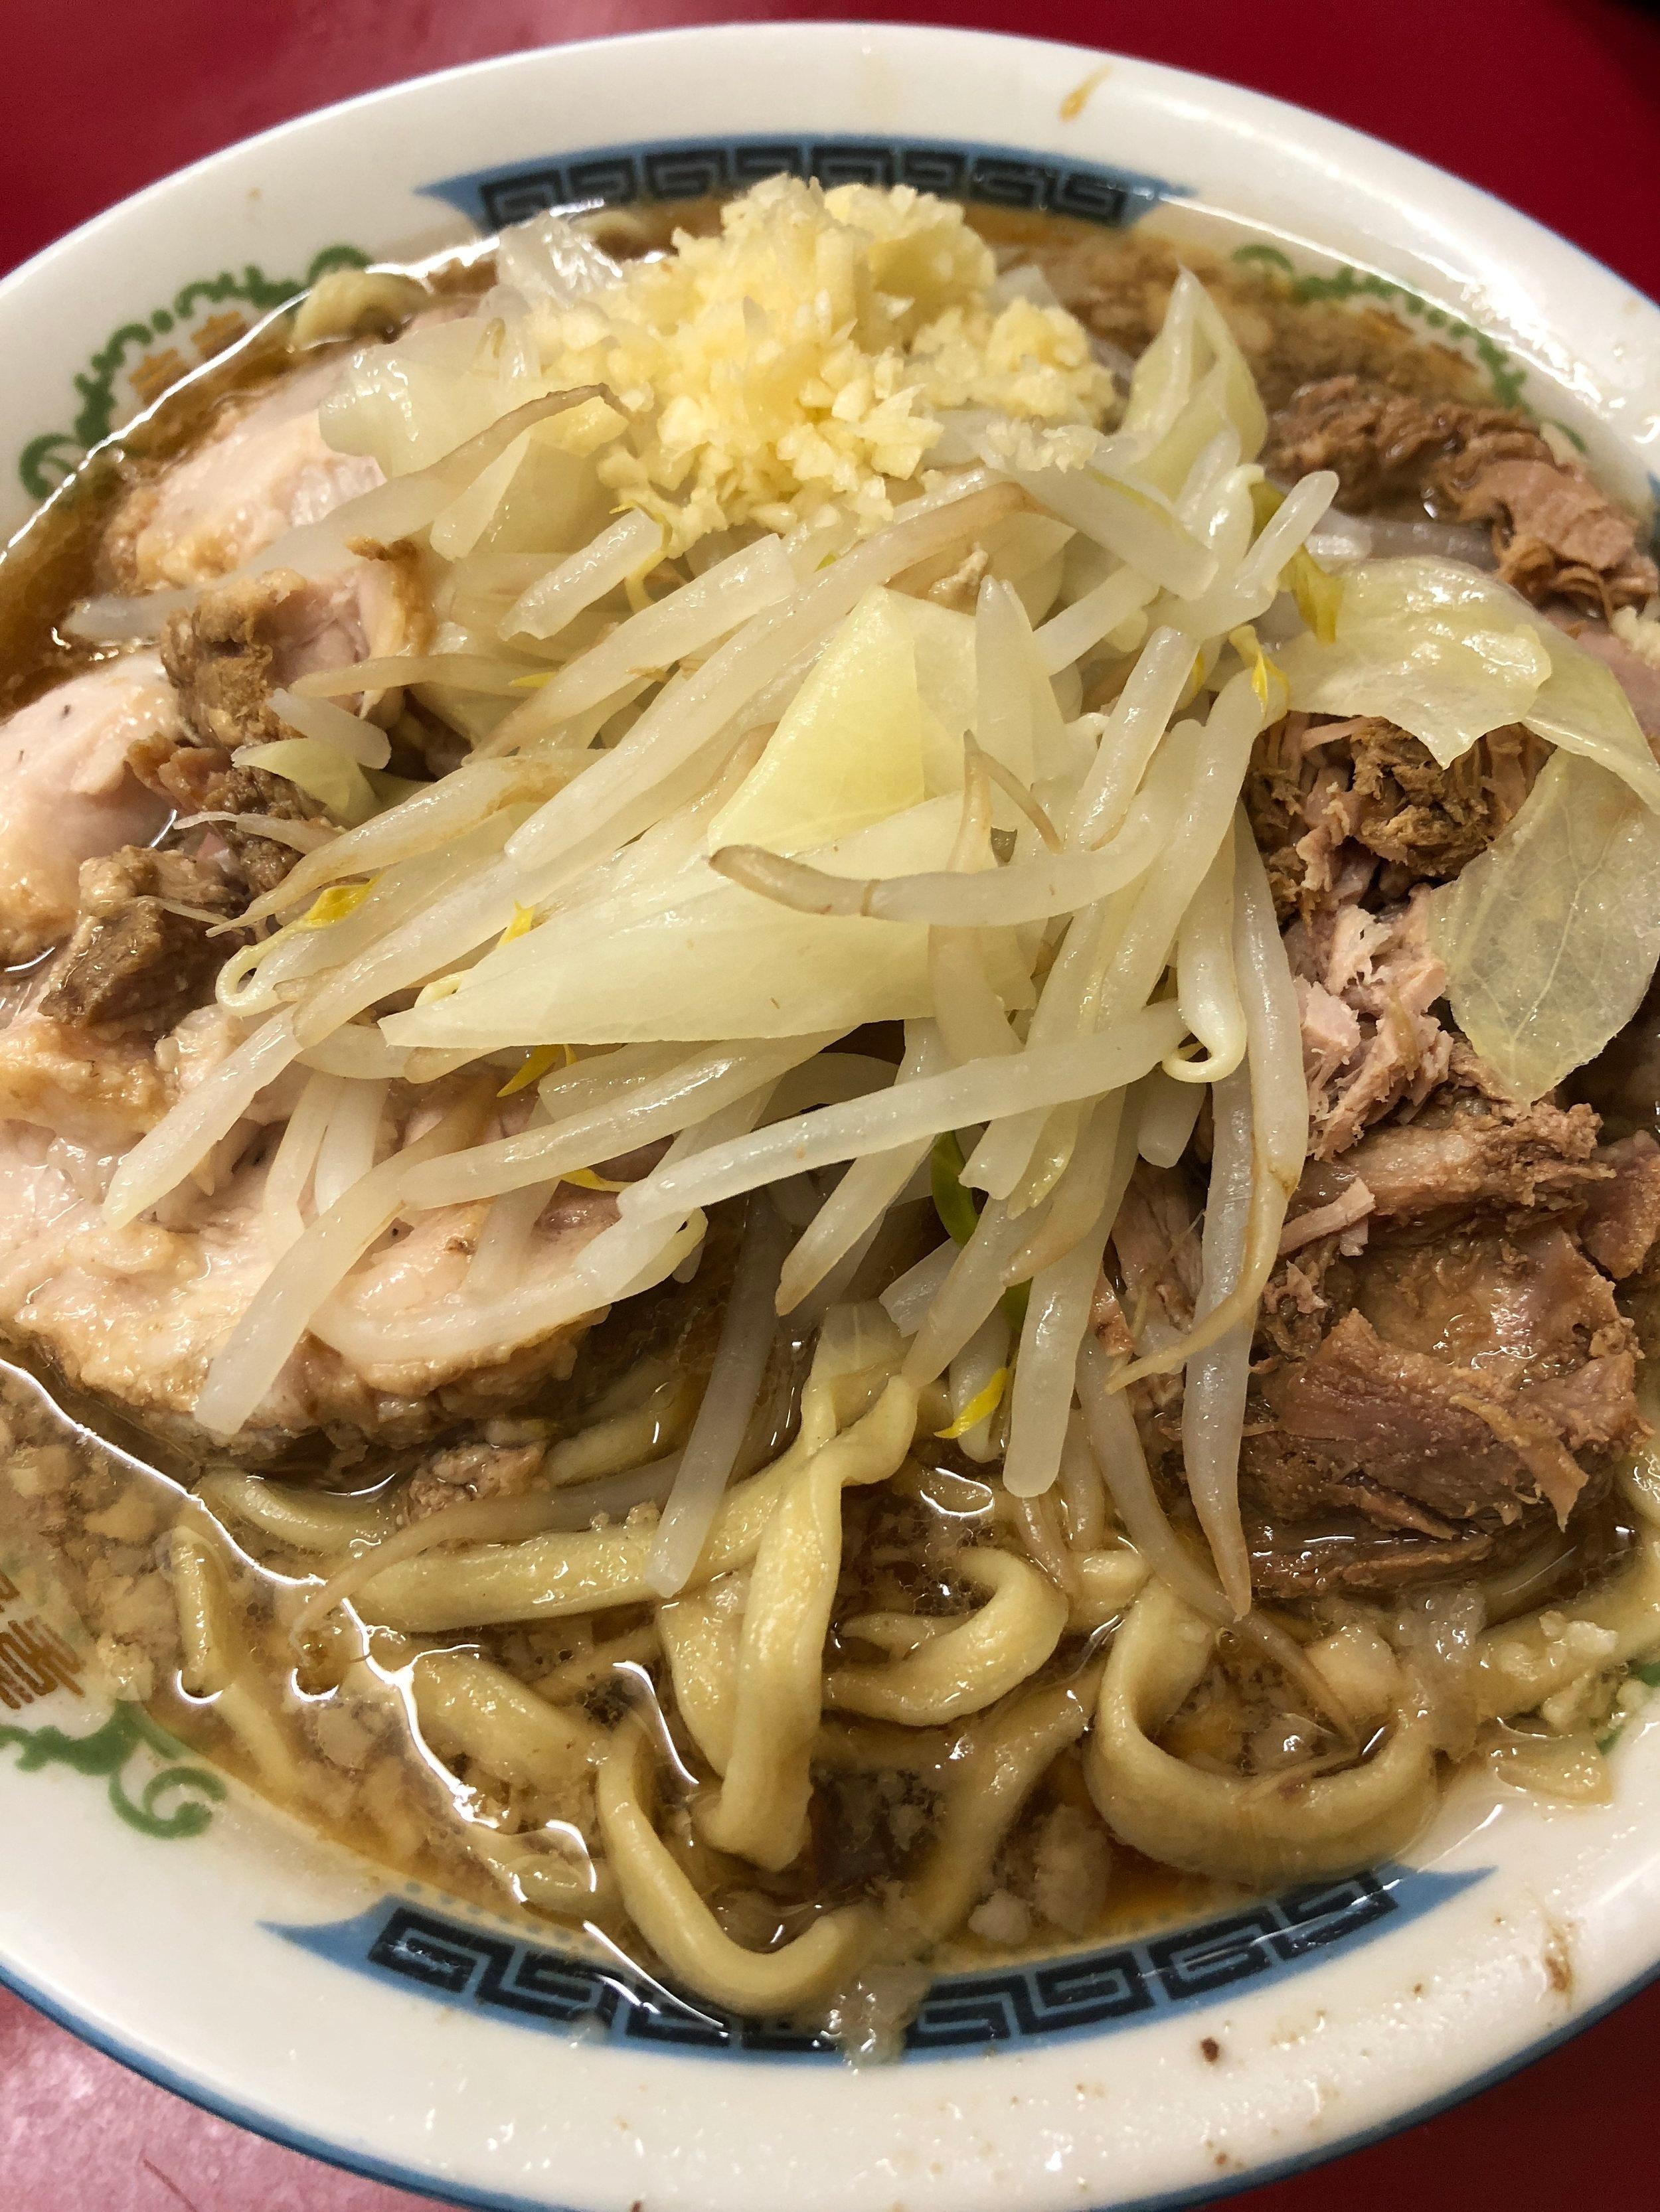 ramen-ramenjiro-tokyo-japanfoodtour-japanfoodtrips-ramentour-tokyofoodtour-bestramen-jiro.JPG